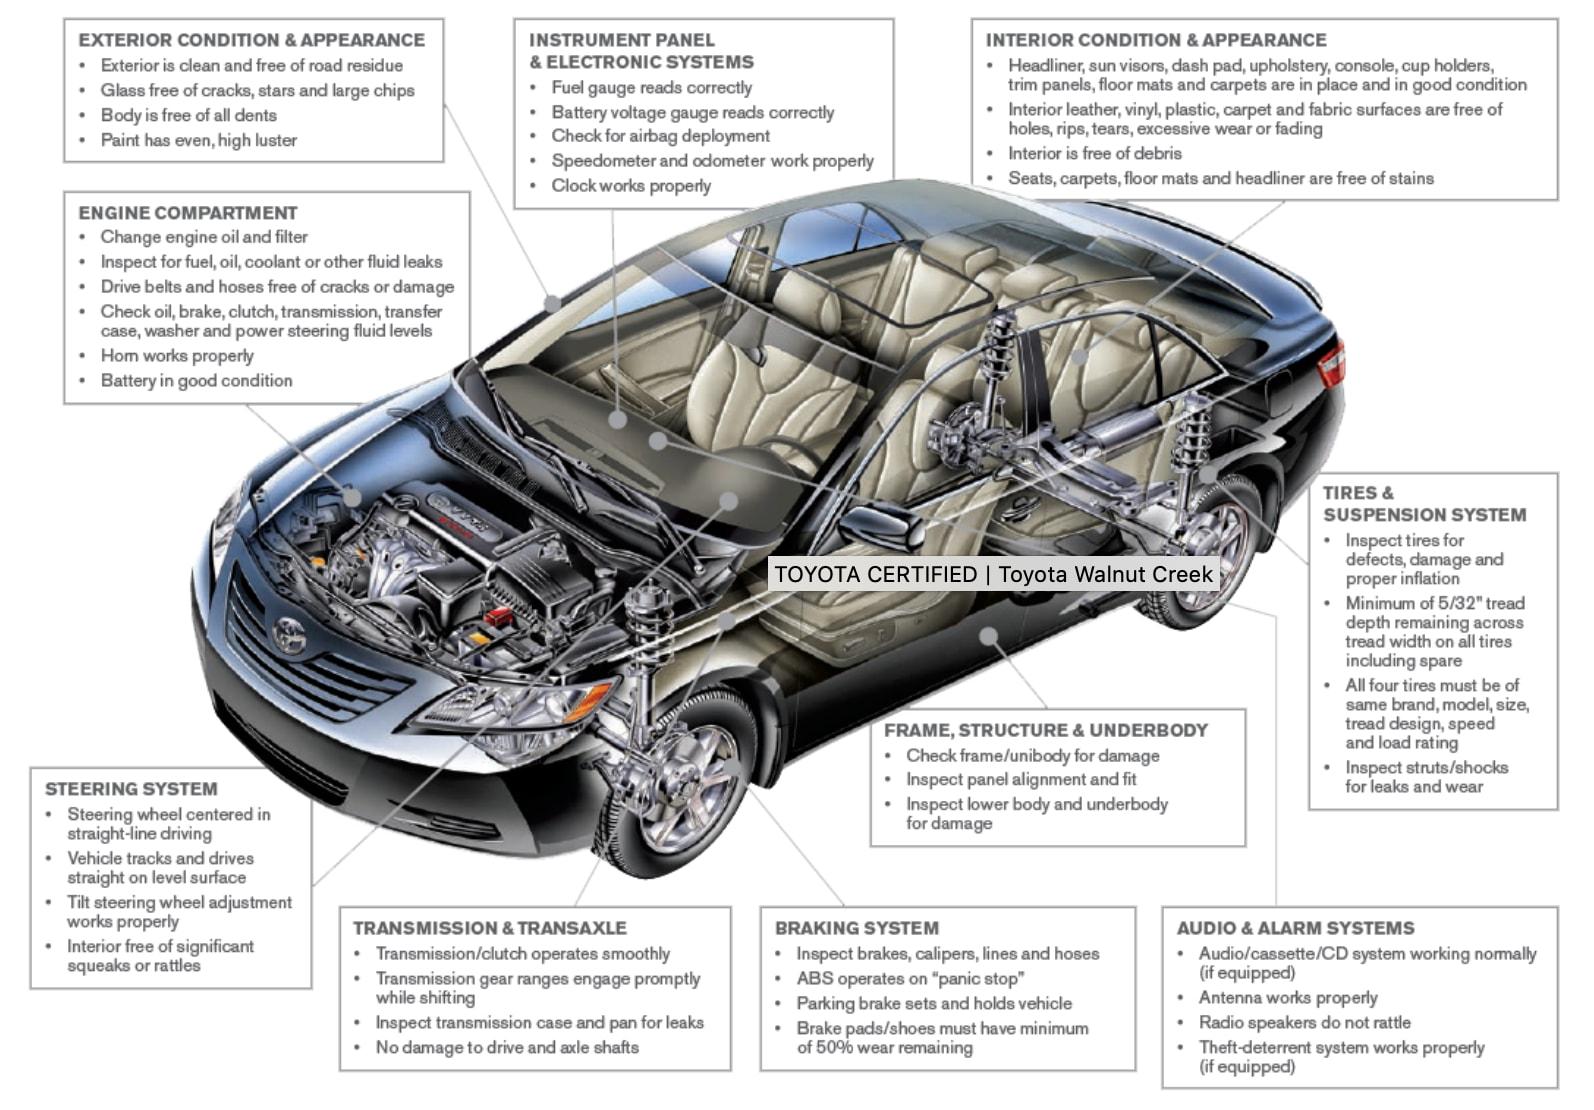 Toyota Certified Used Vehicles | Toyota Walnut Creek